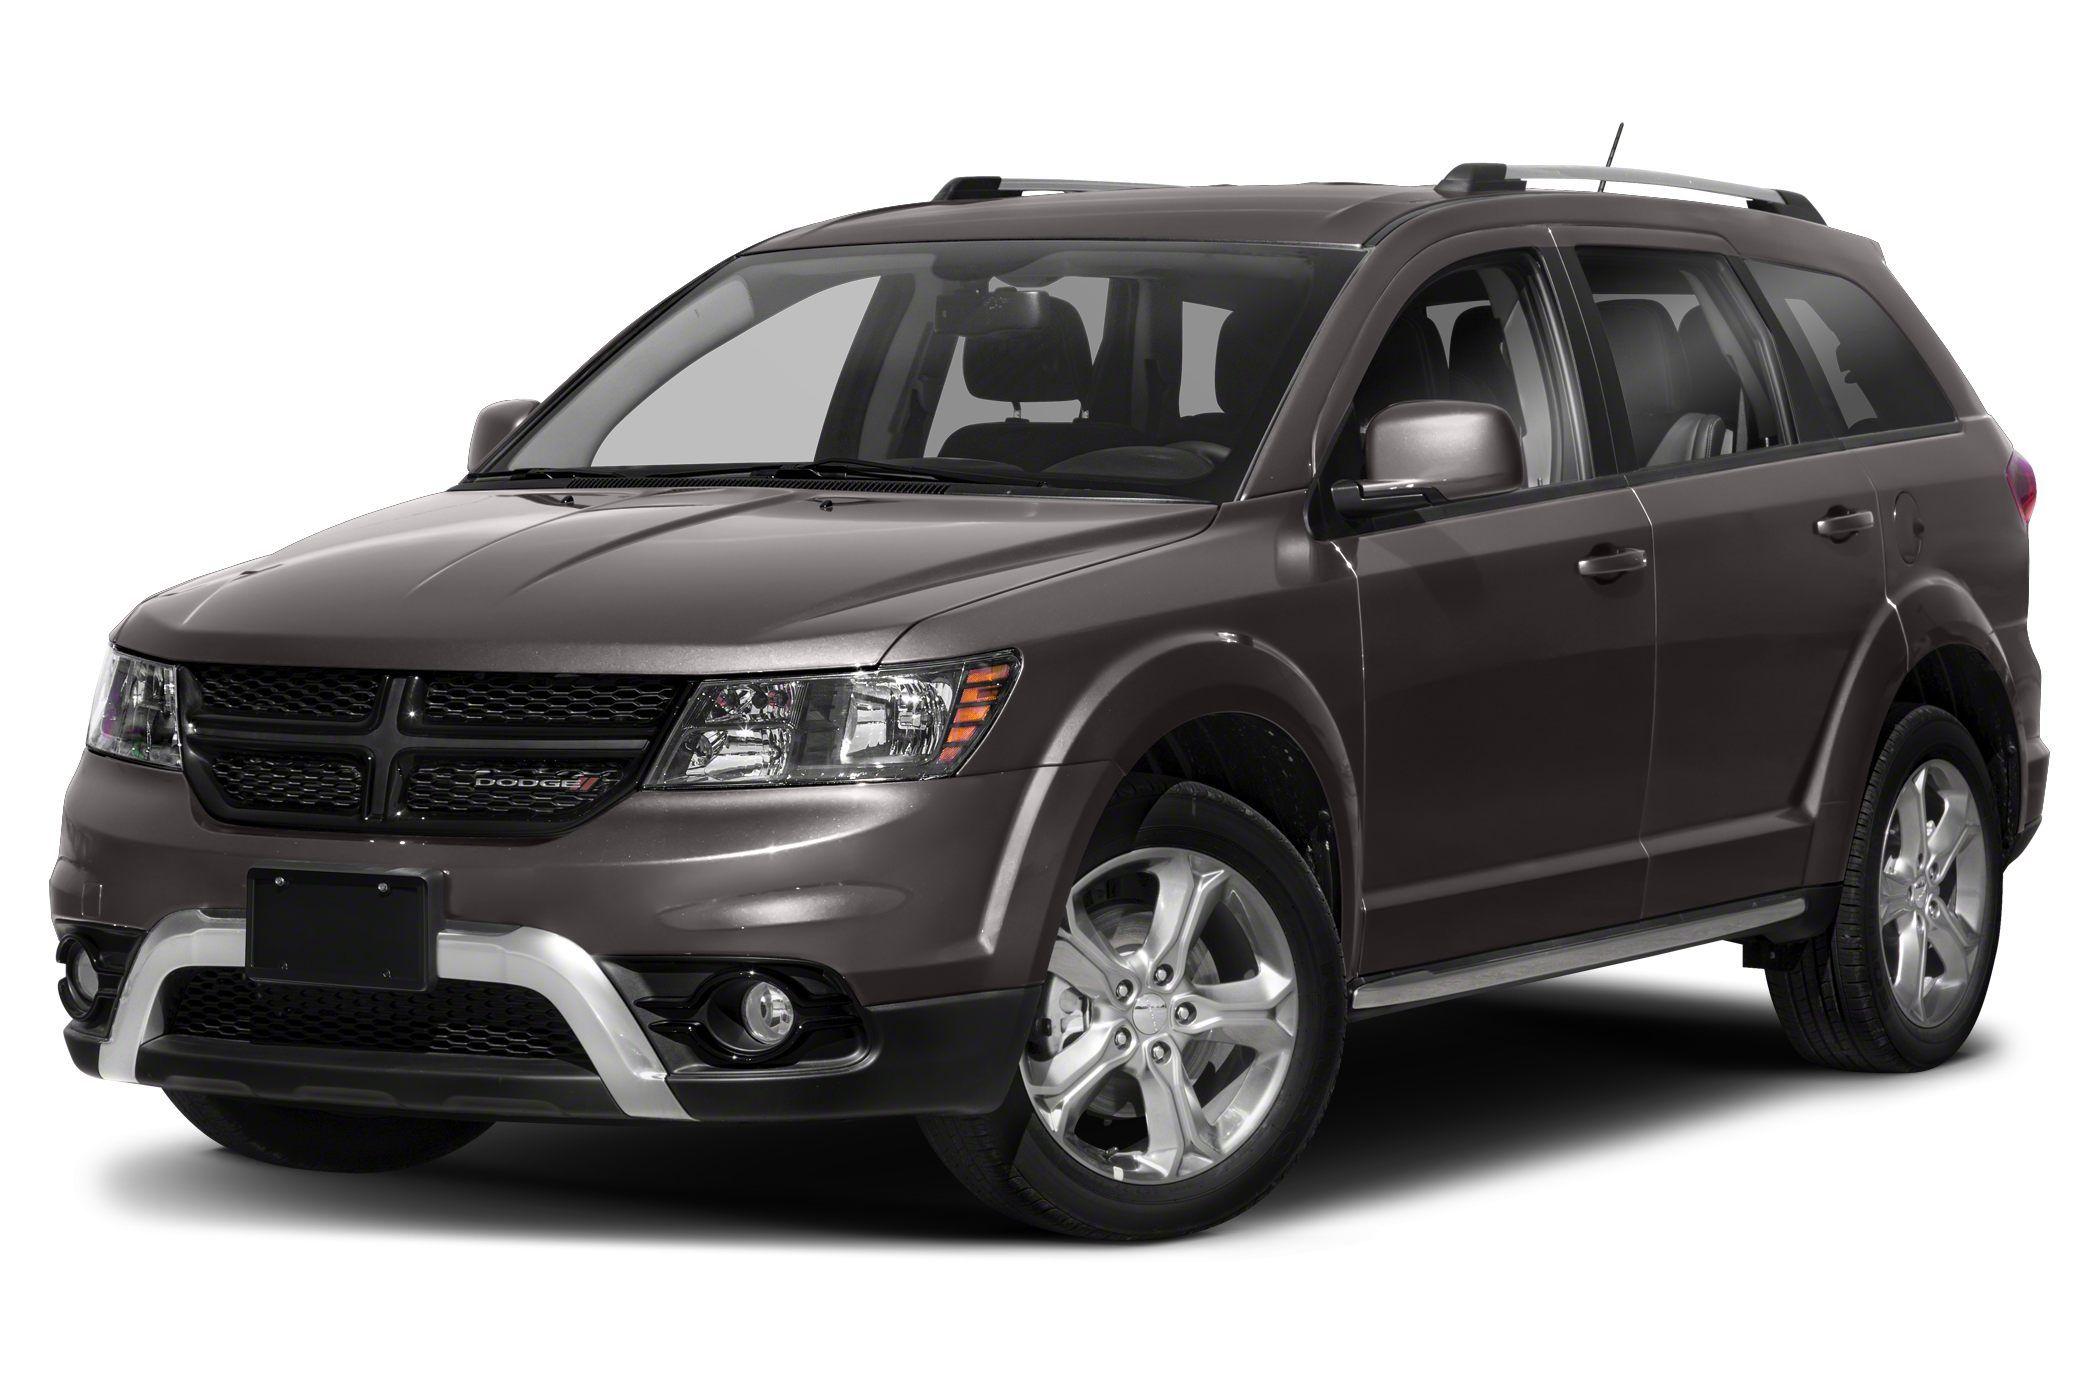 2020 Dodge Journey Interior Specs Di 2020